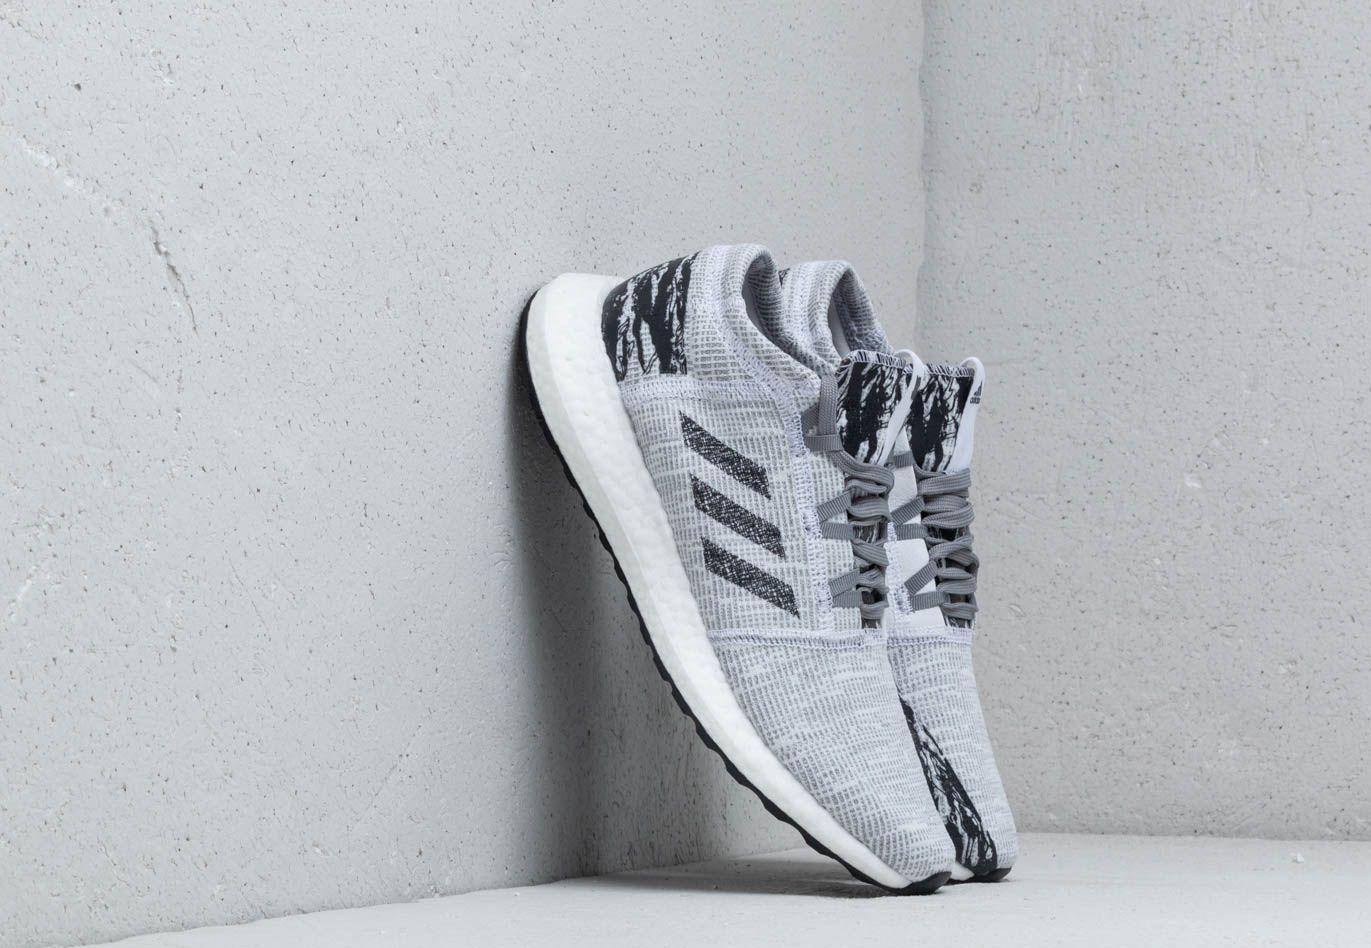 69f168f6ff274 adidas Originals. Men s Adidas X Undefeated Pureboost Go Core Black  ...